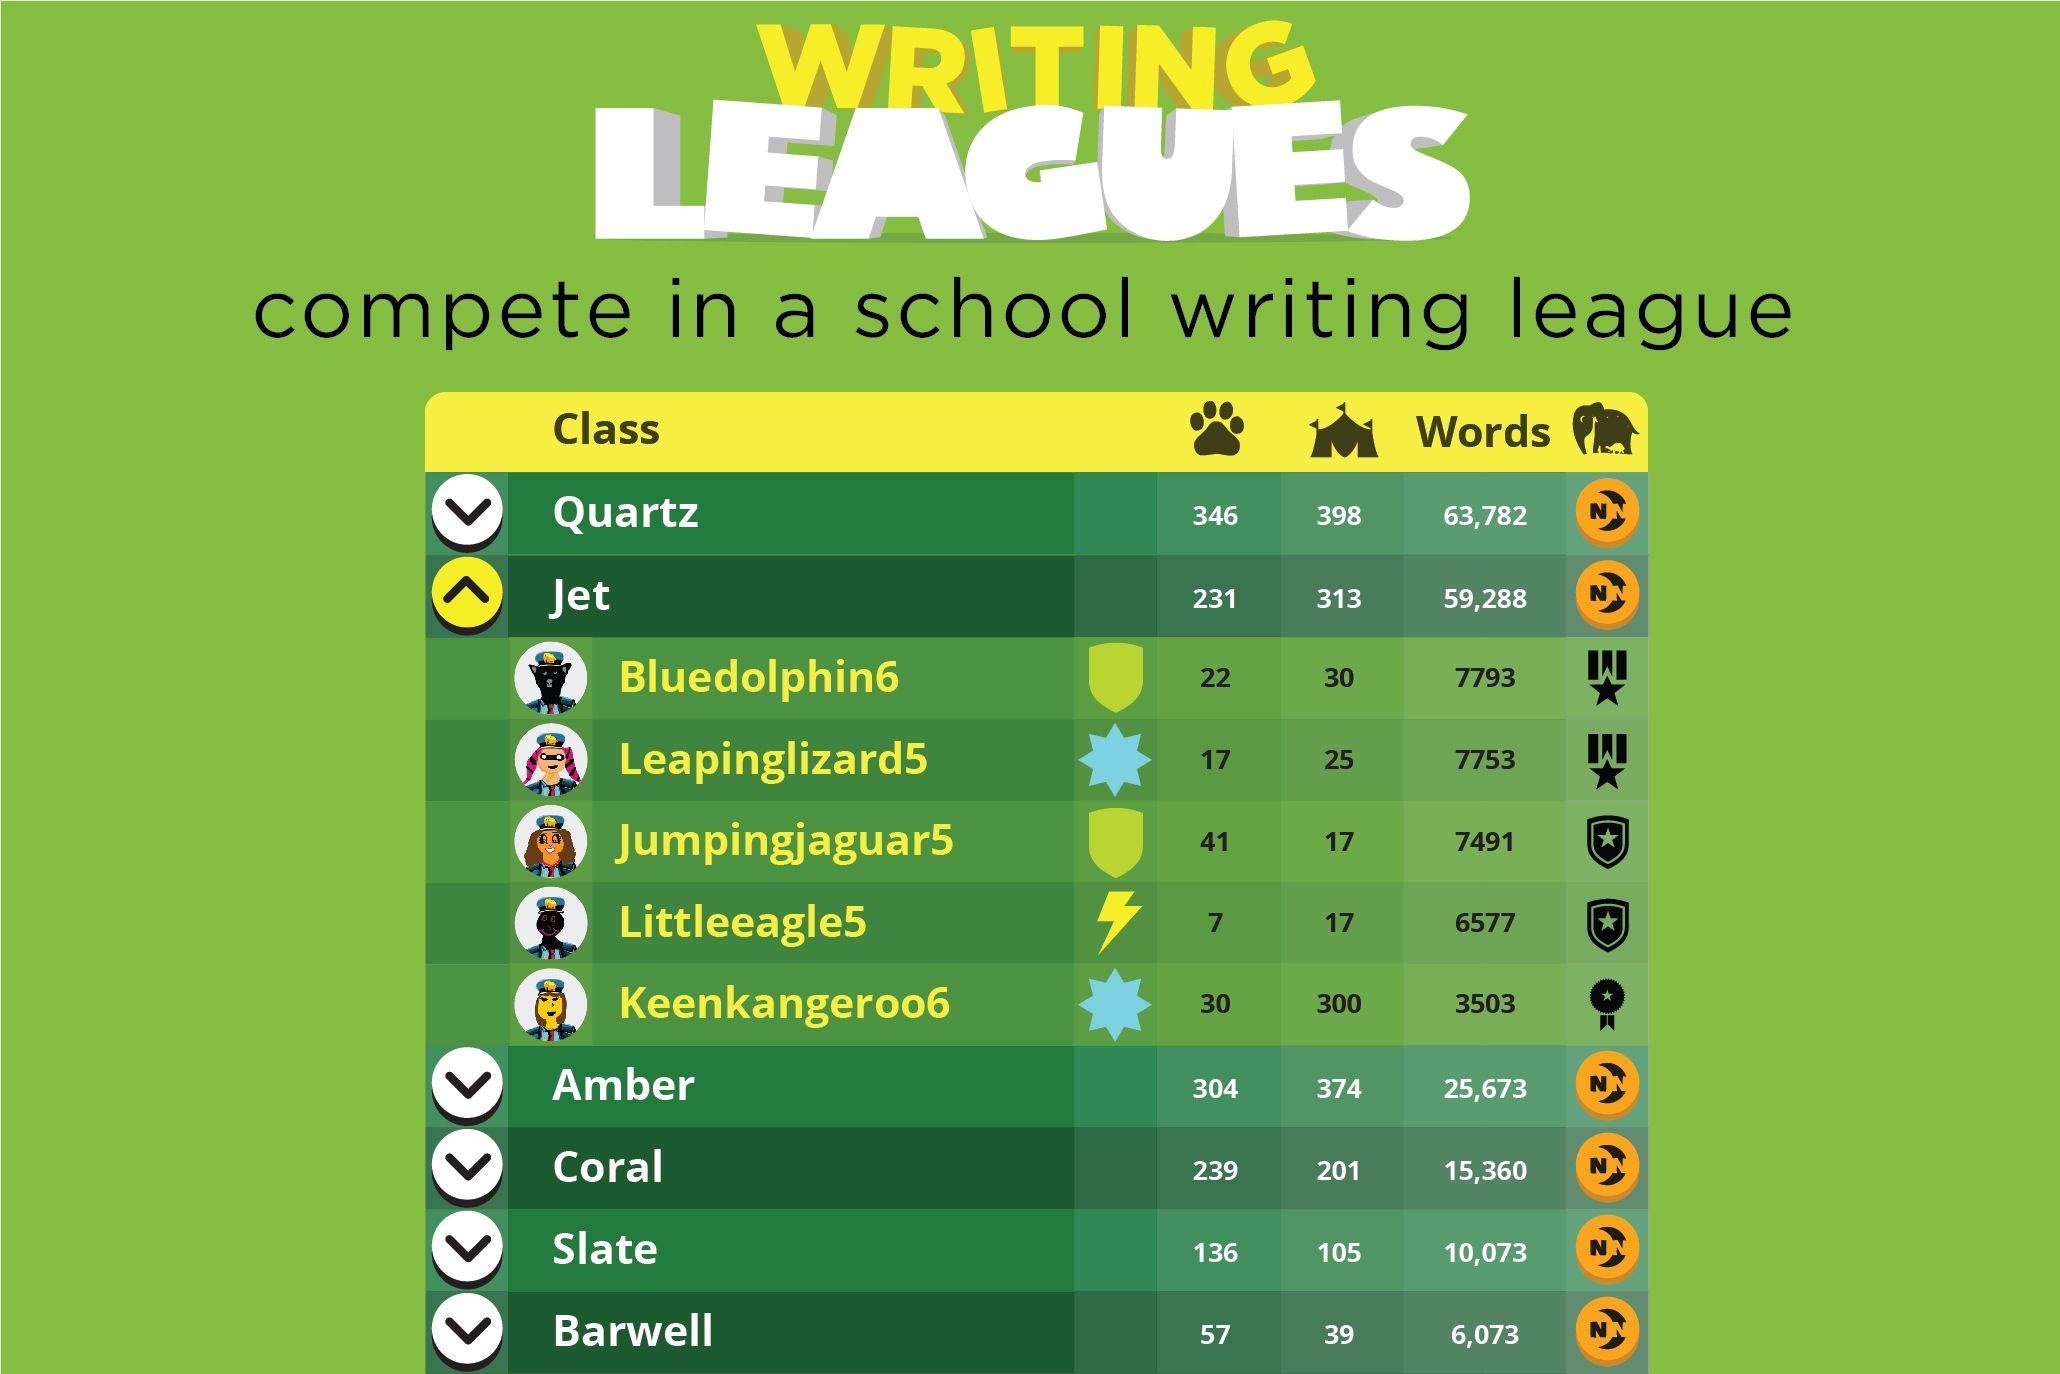 writing leagues.jpeg